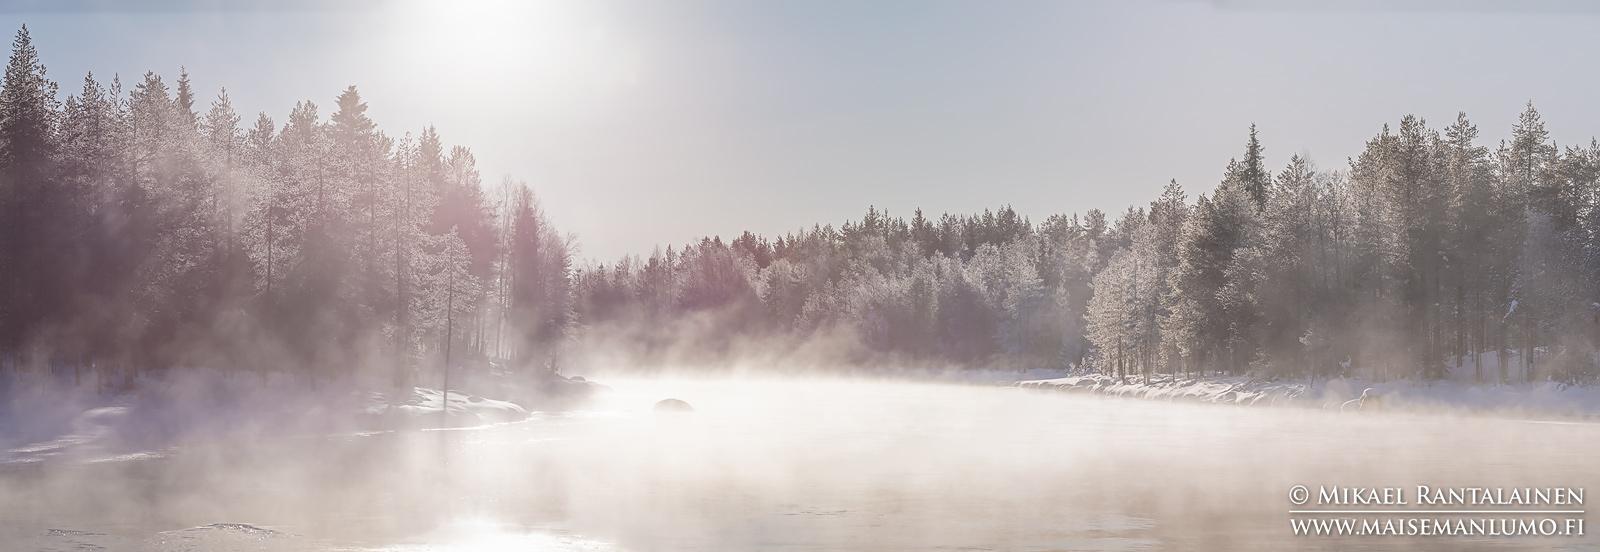 Kiveskoski, Kuusamo (PT119)